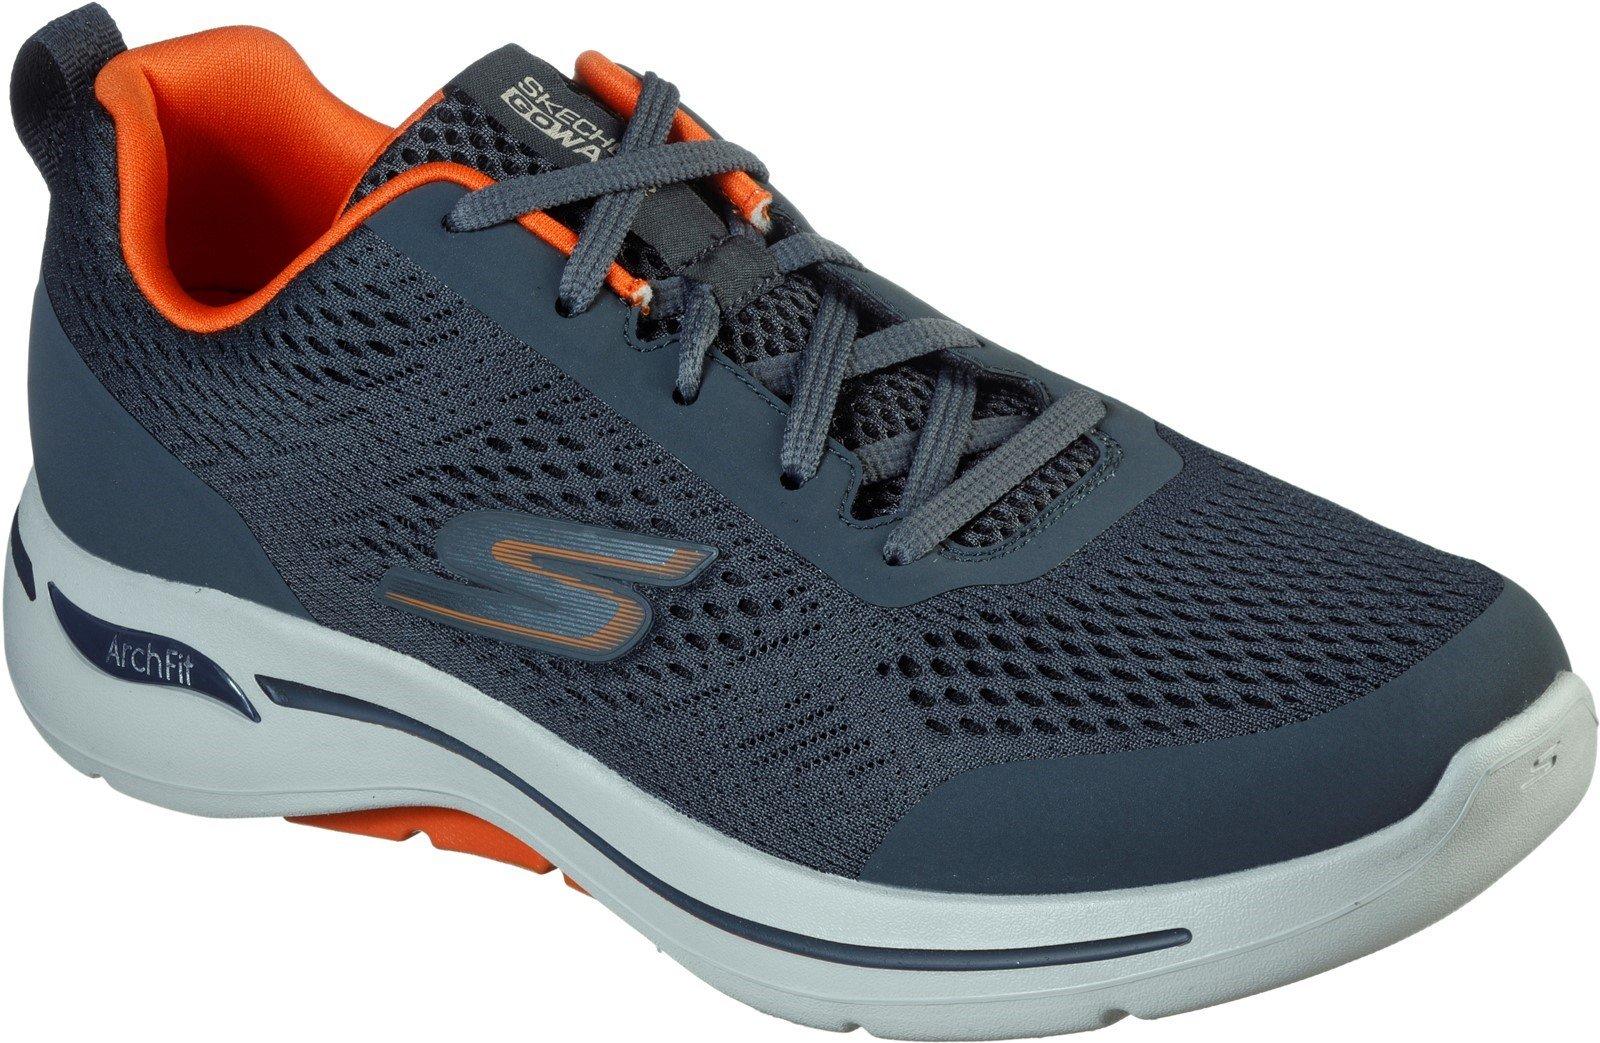 Skechers Men's Go Walk Arch Fit Idyllic Sports Trainer Various Colours 32202 - Charcoal/Orange 6